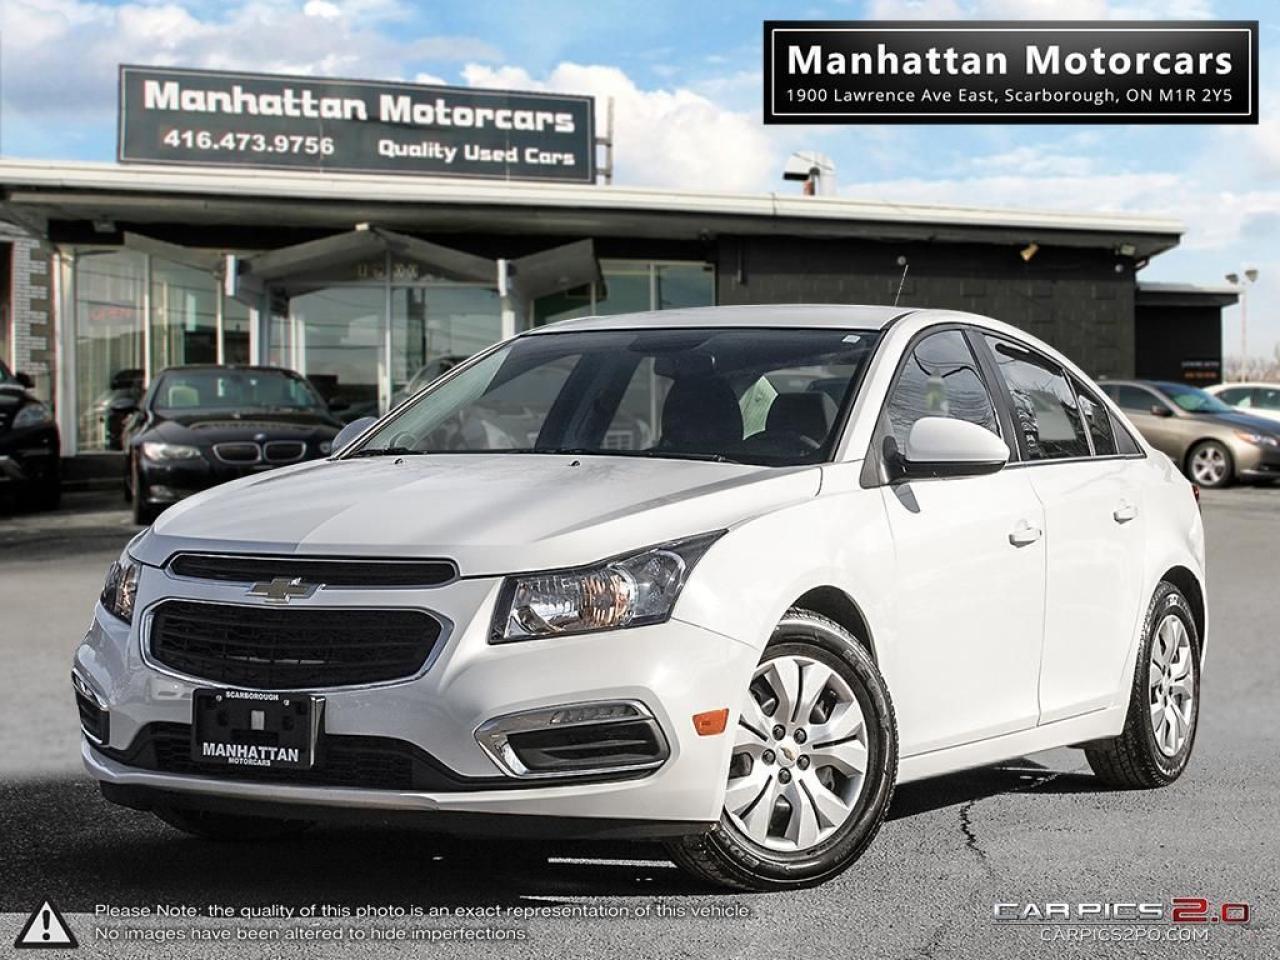 Photo of White 2015 Chevrolet Cruze